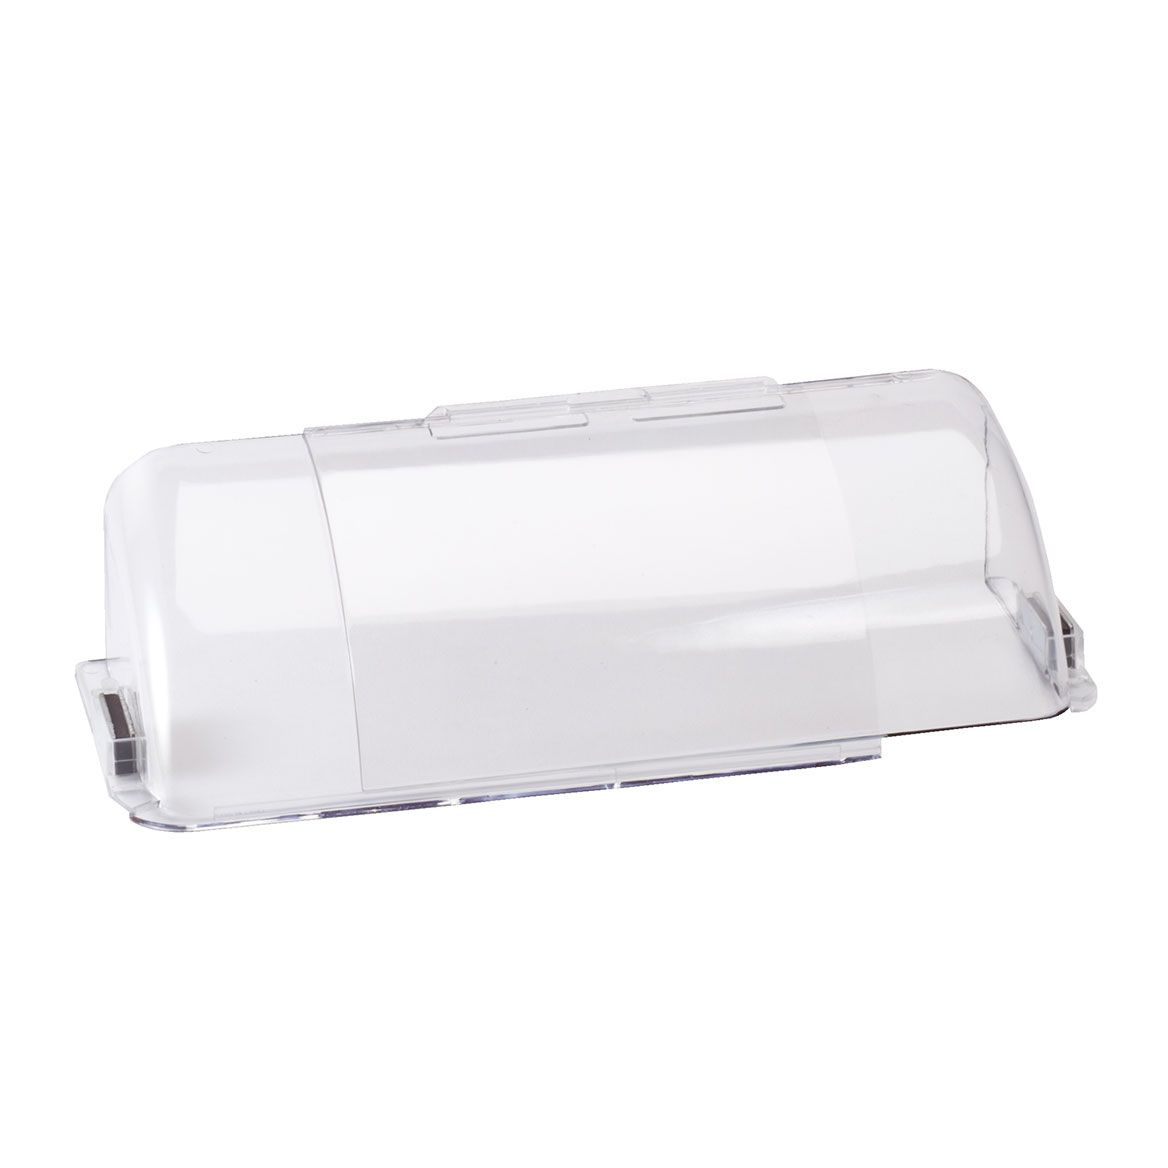 Furnace Vent Deflector-310808